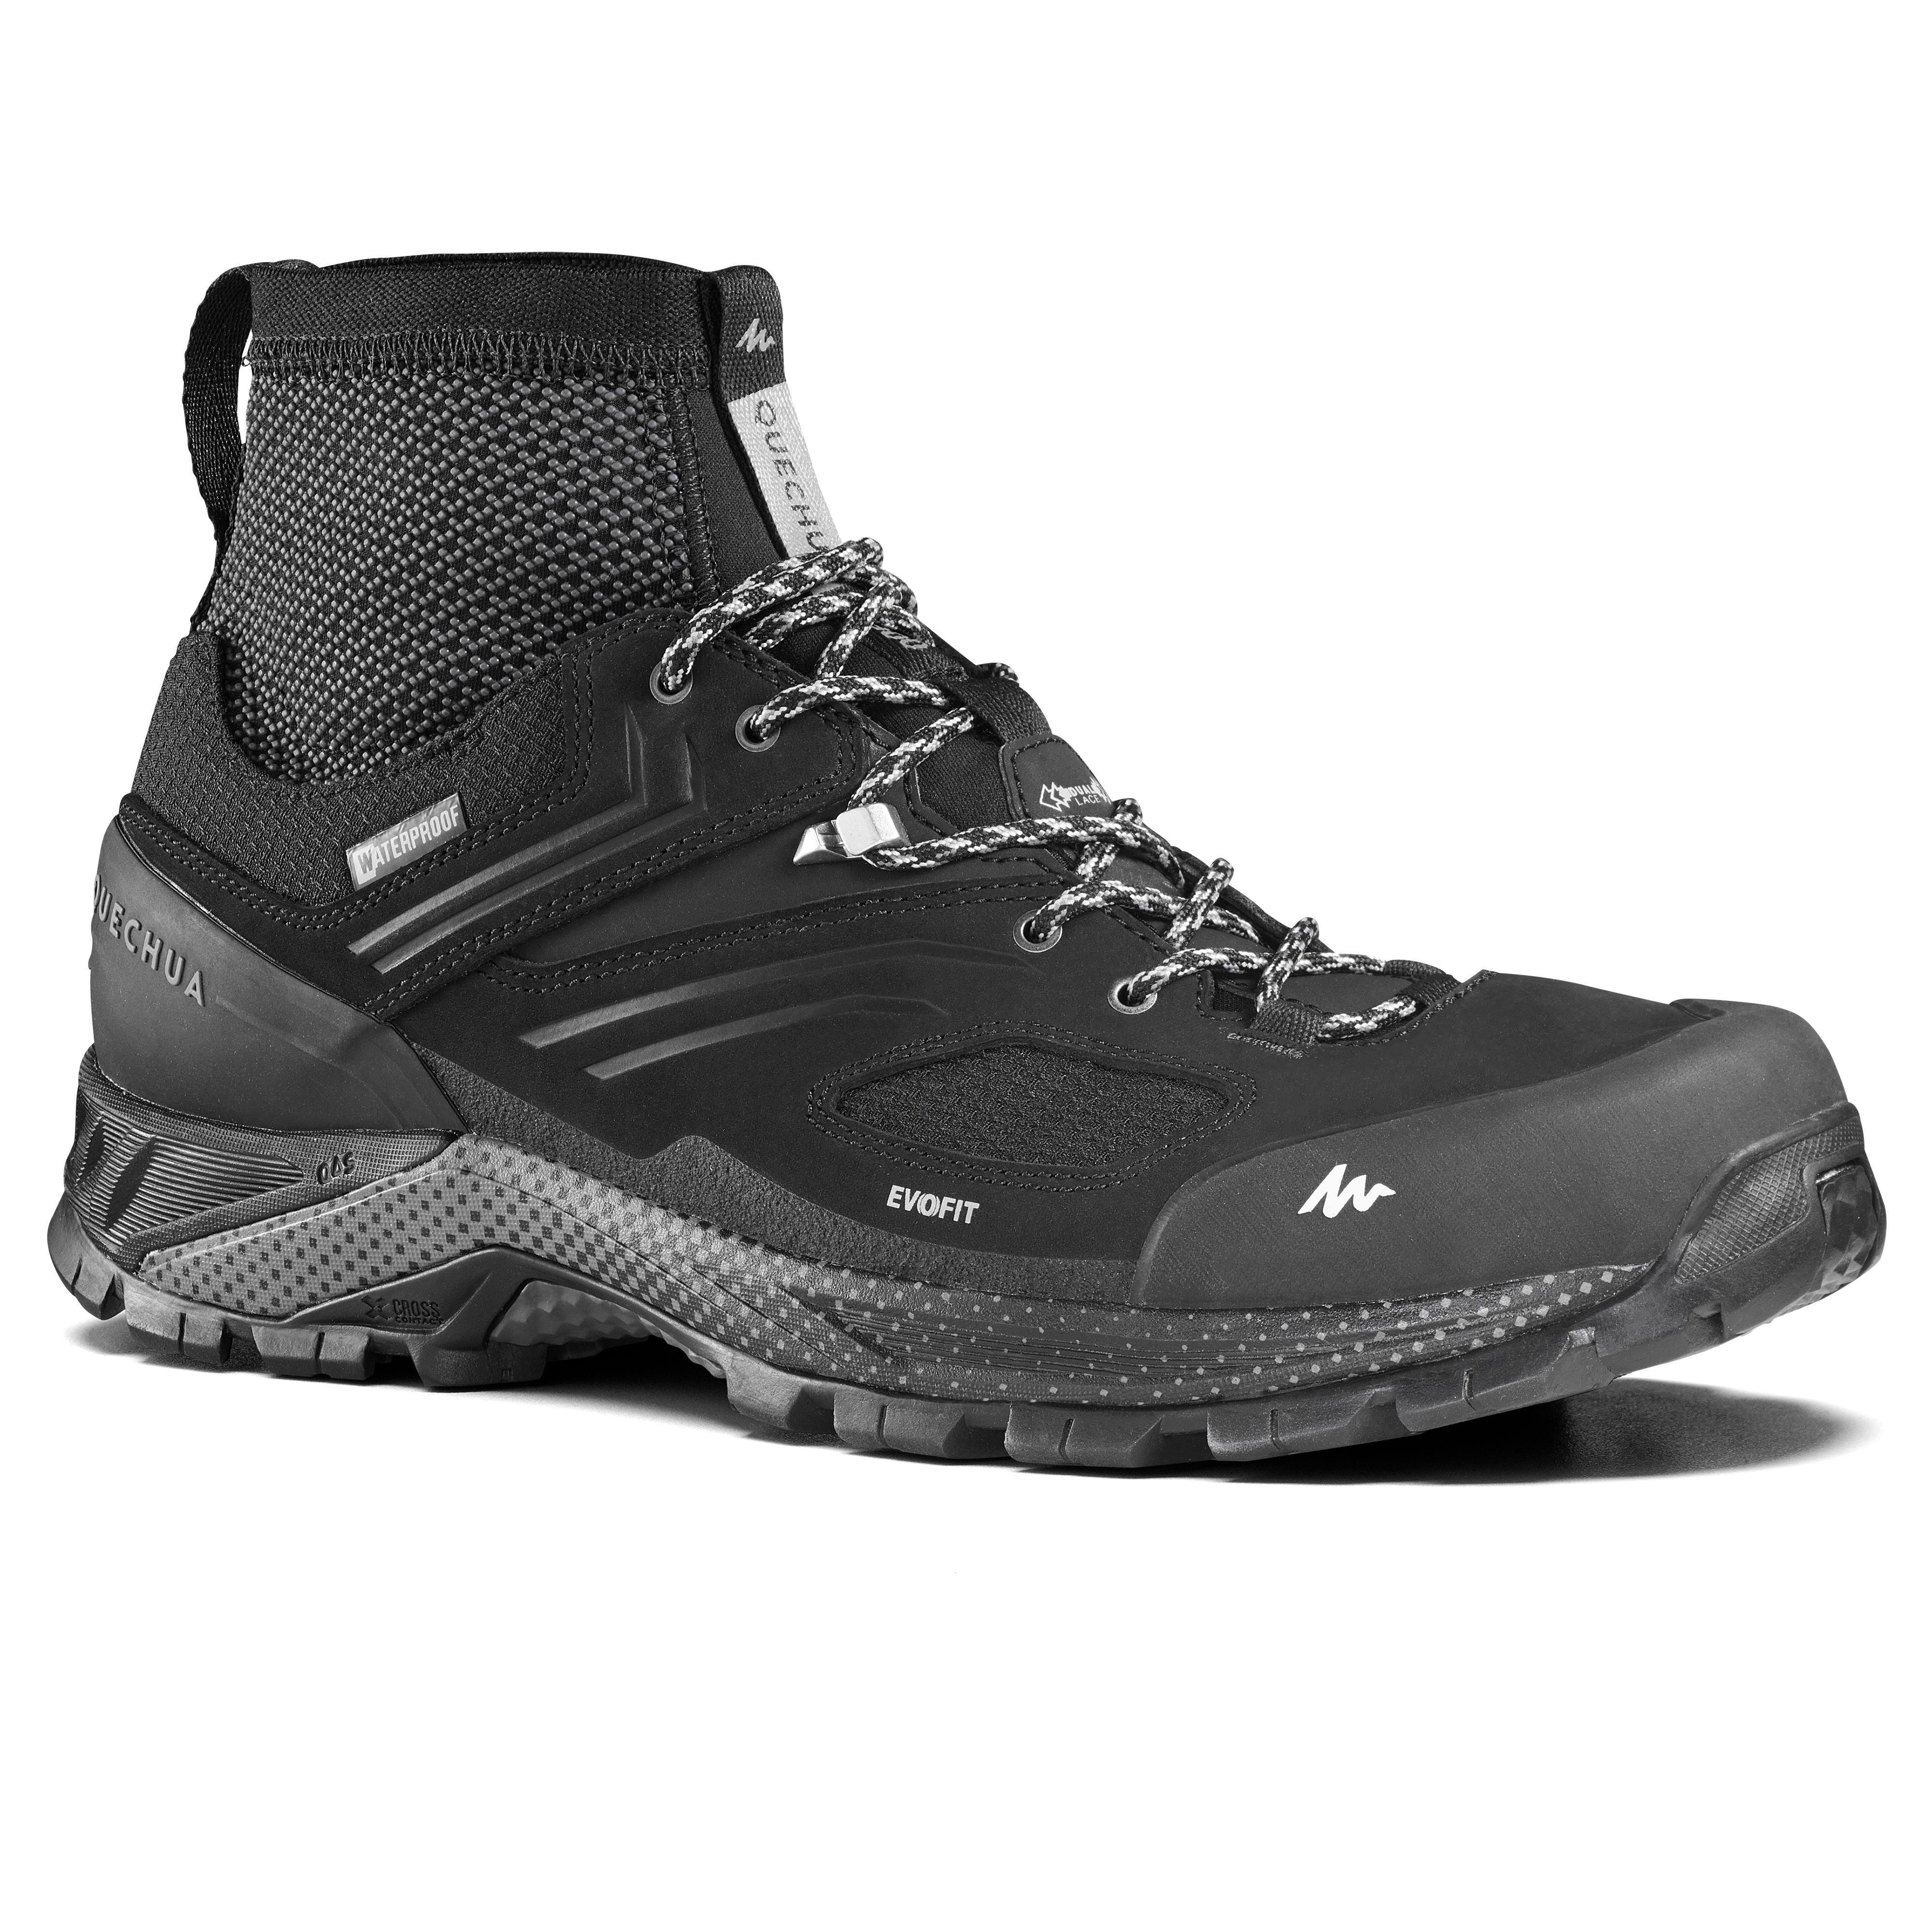 Quechua Mh900 Mens Waterproof Walking Shoes - Black